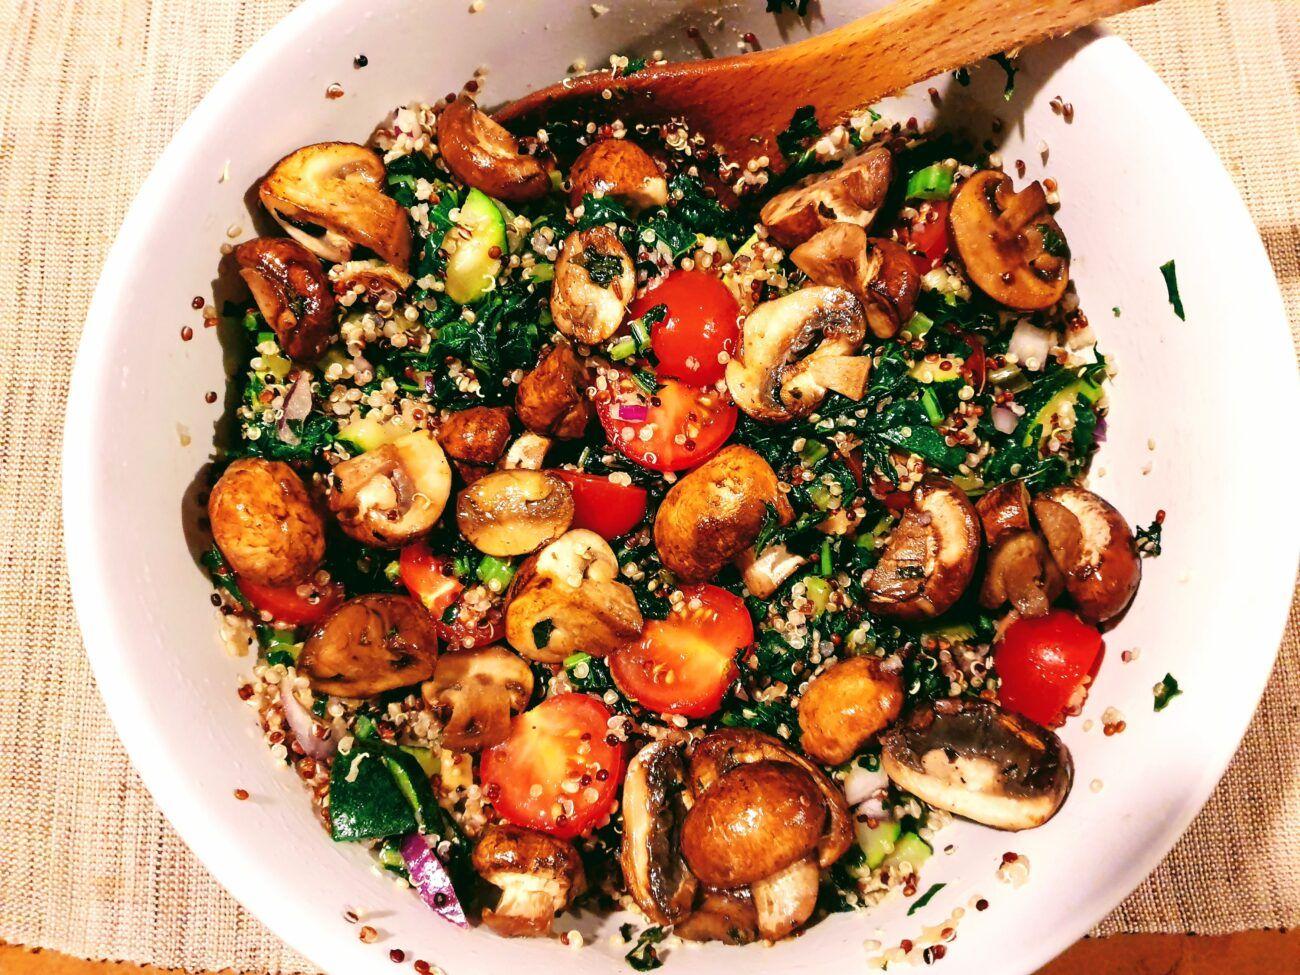 Warm Quinoa and Kale Salad